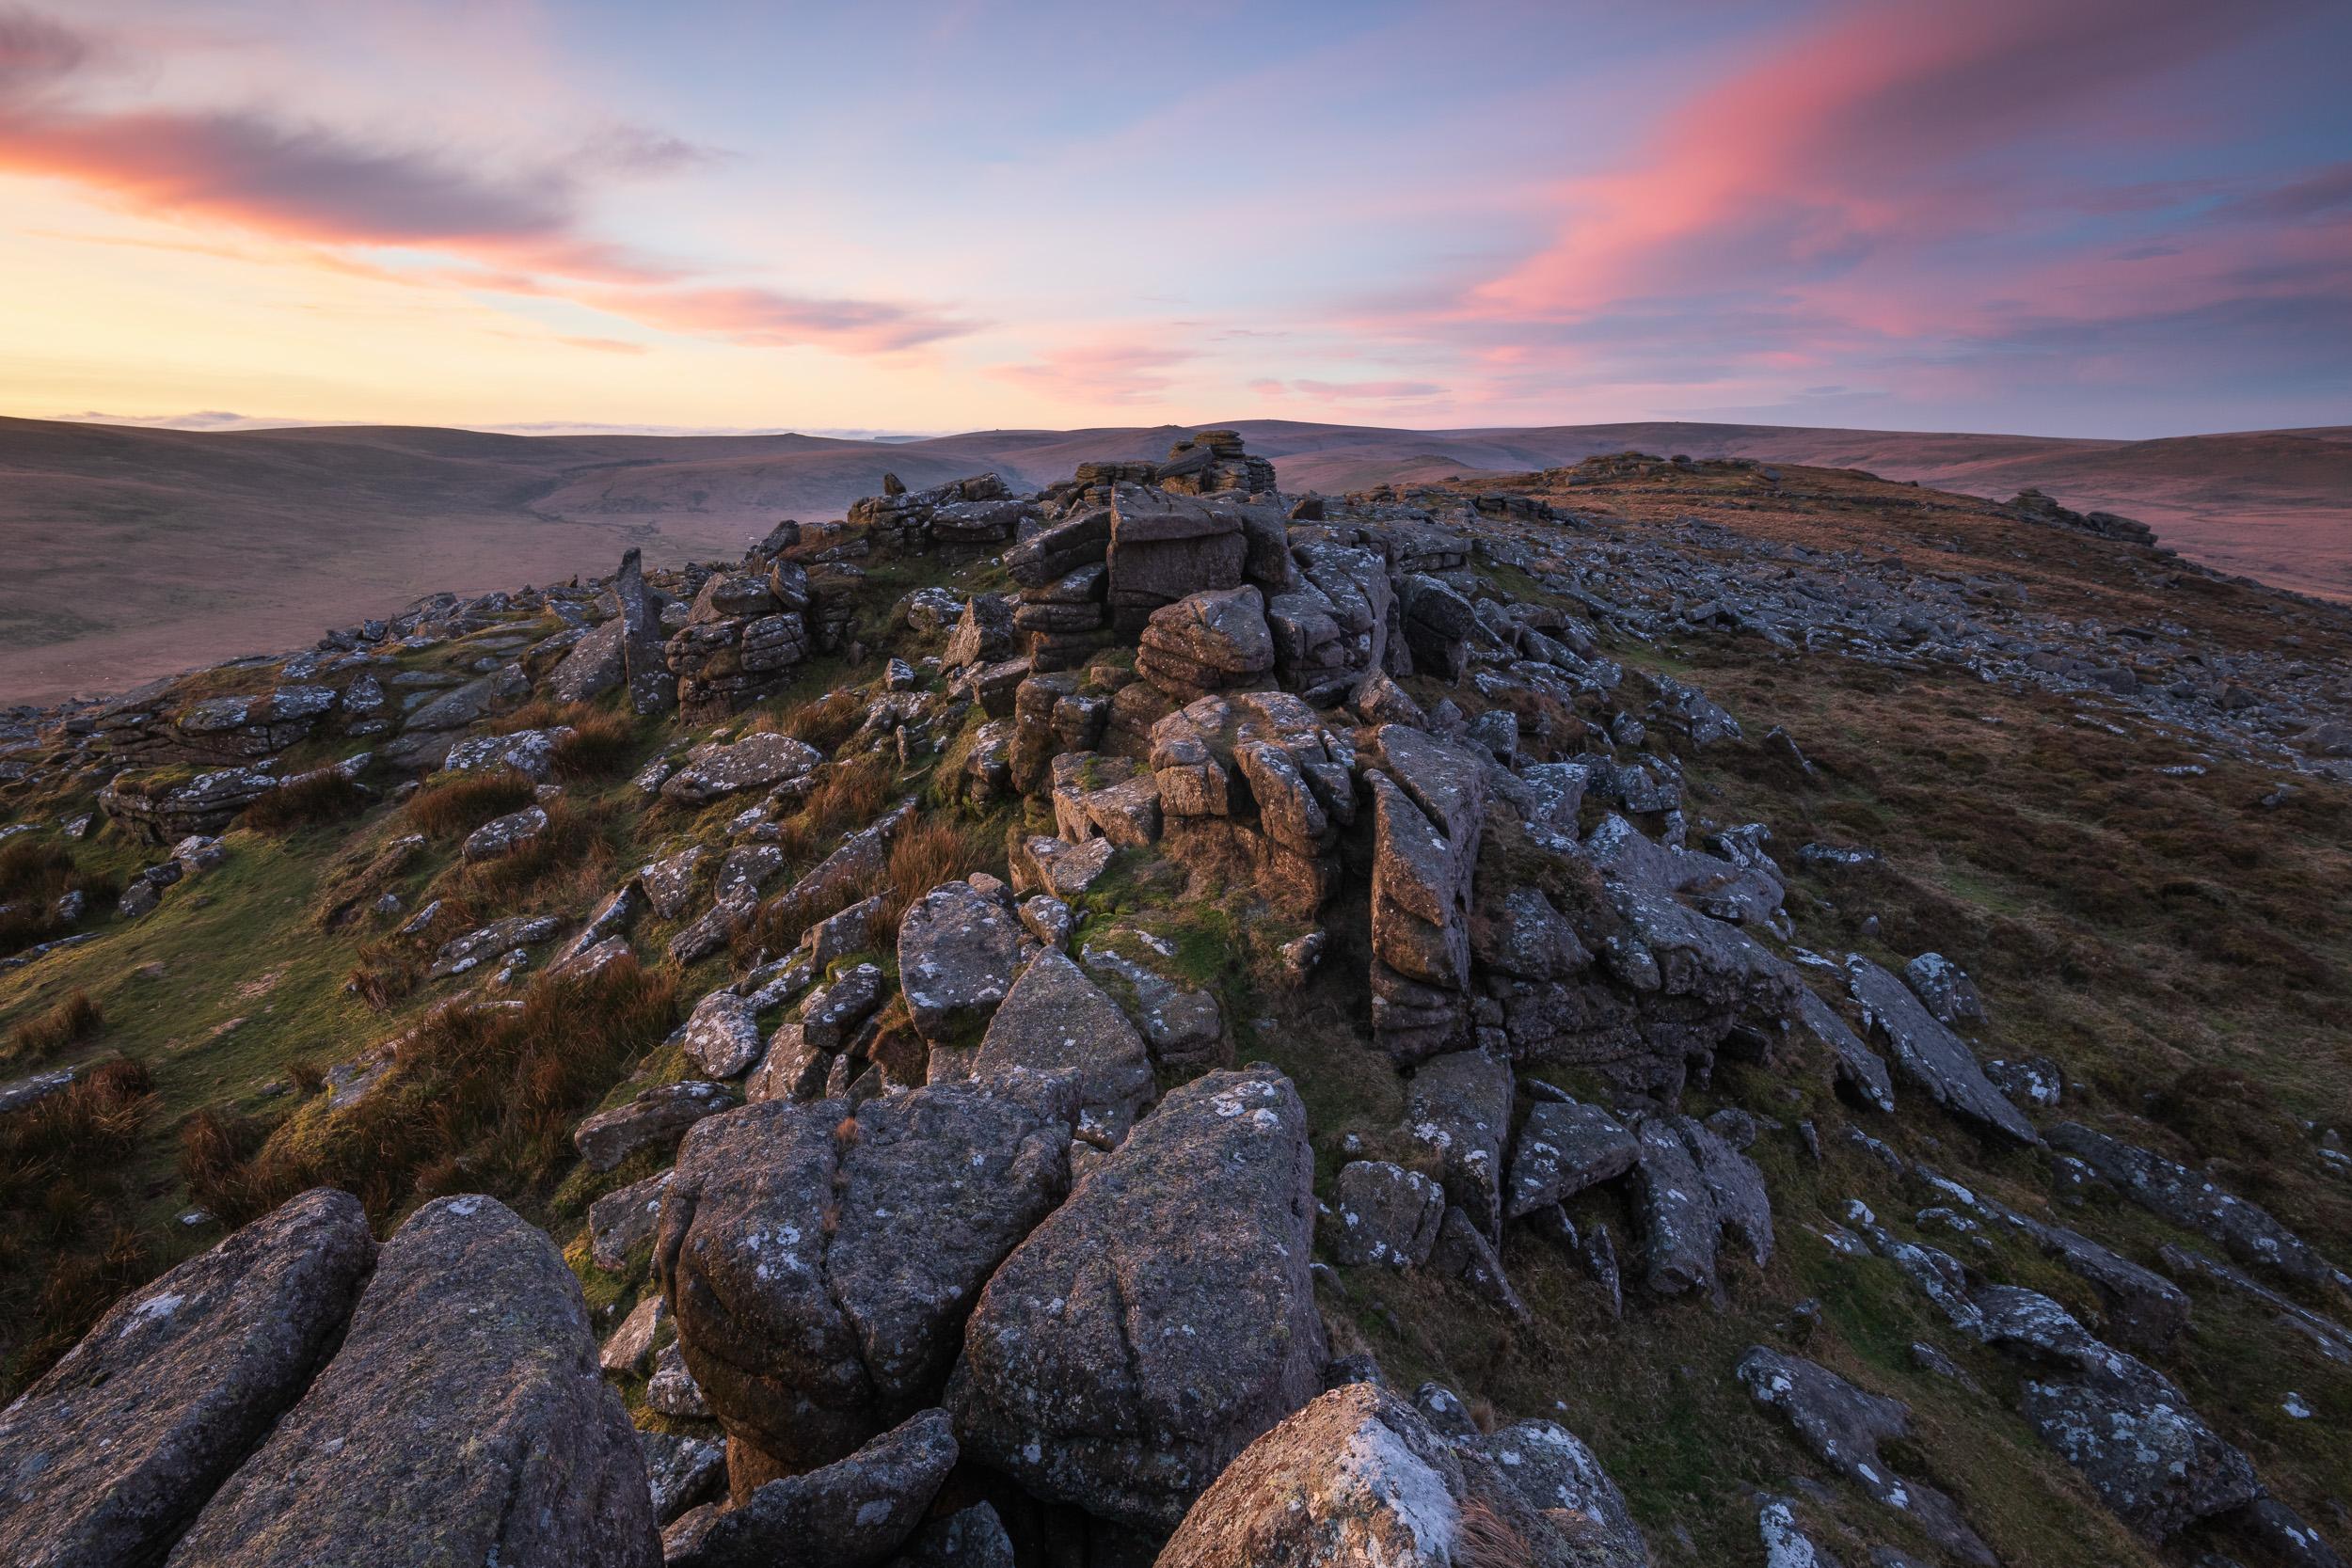 First Light at Belstone, Dartmoor, Devon  - Nikon D850, Nikkor 16-35 mm f/4 @ 16 mm, f/13, 3 secs @ ISO 64.